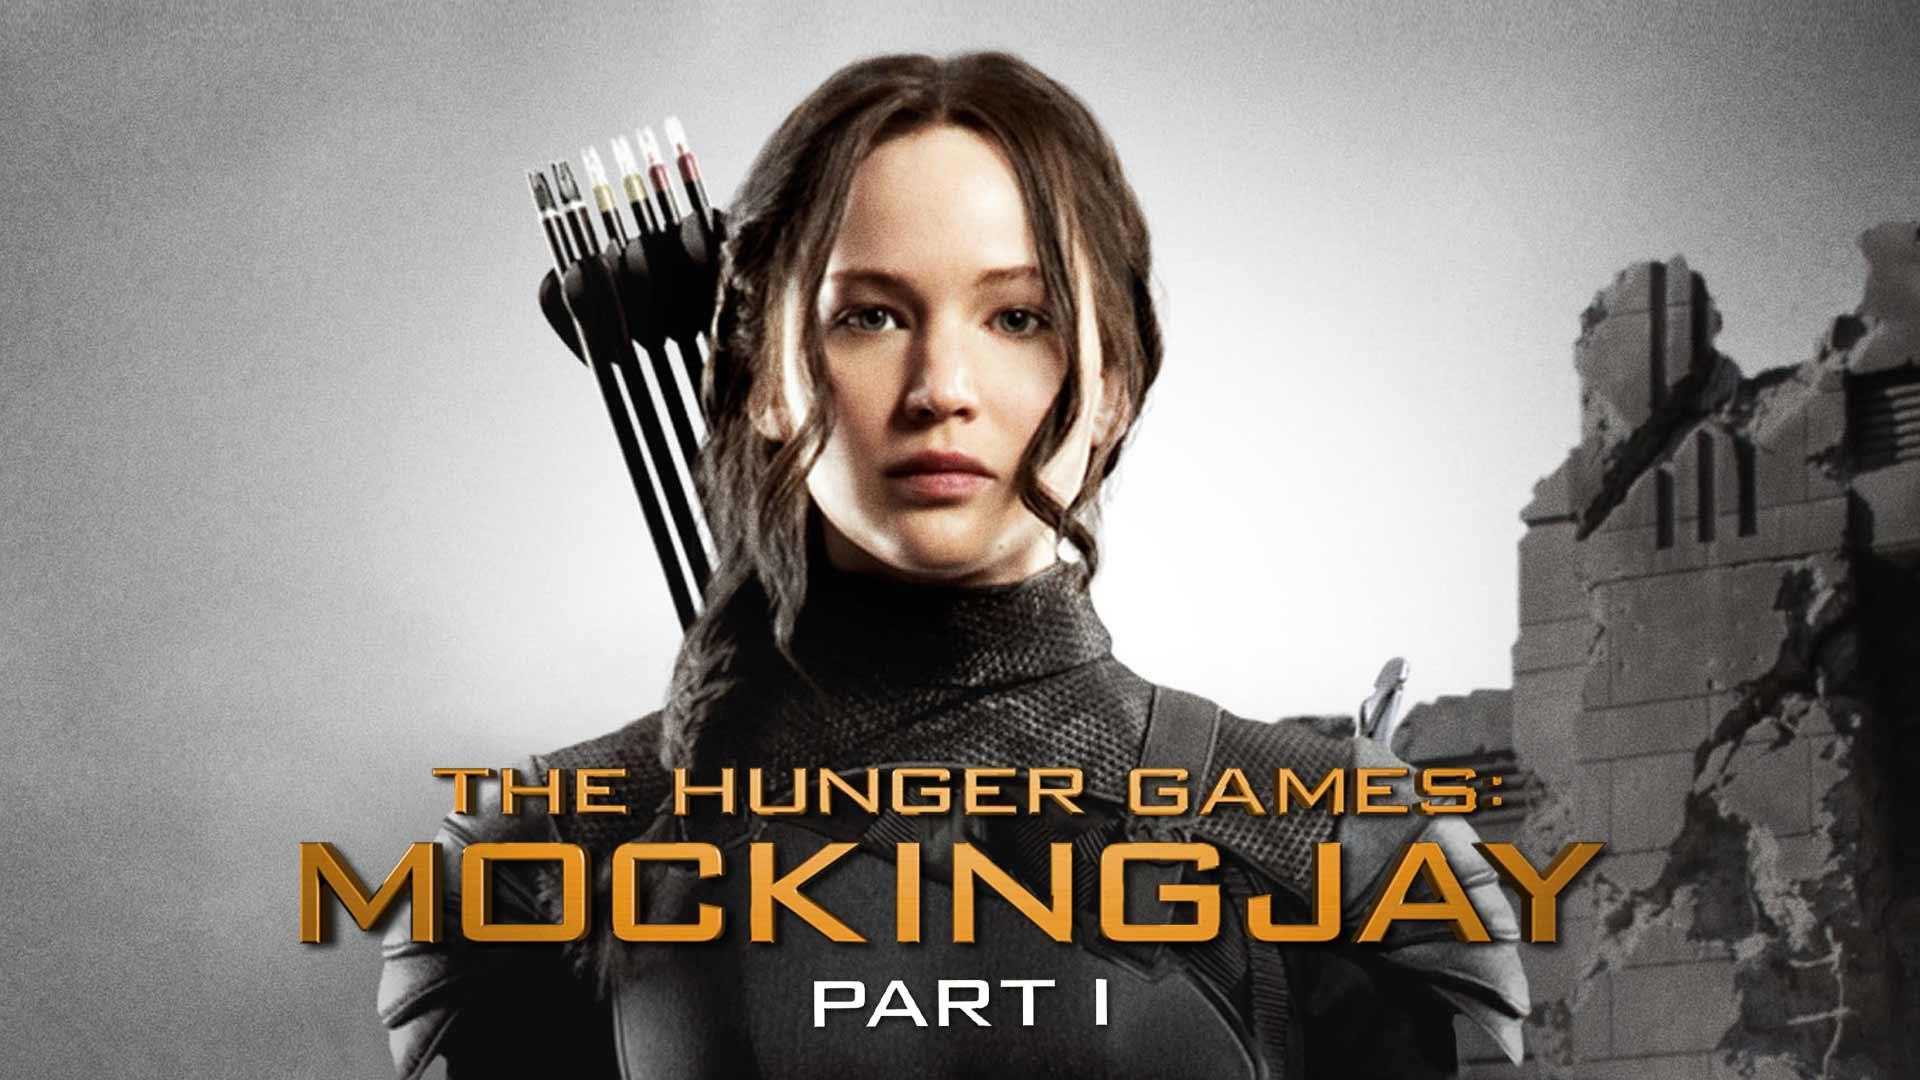 The Hunger Games: Mockingjay Part 1 (4K UHD)